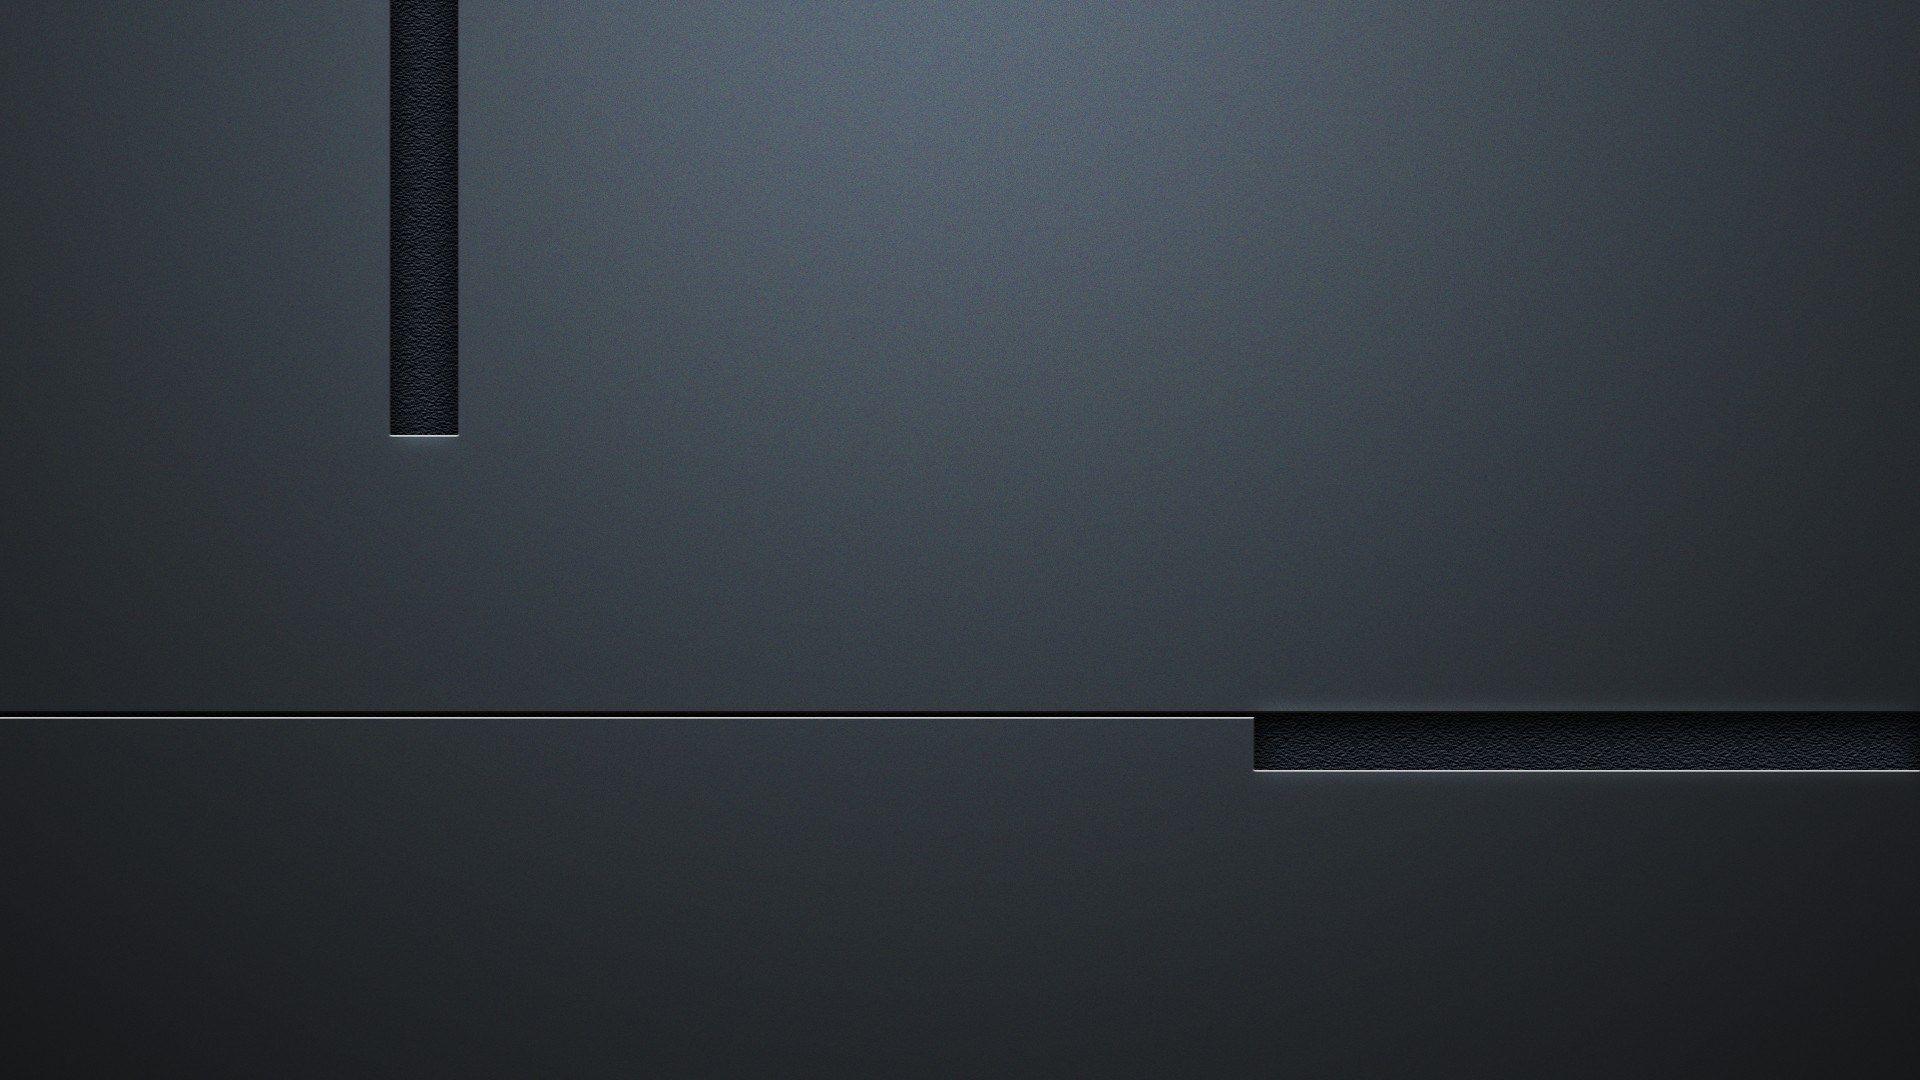 1920x1080 minimalism wallpaper of desktop background